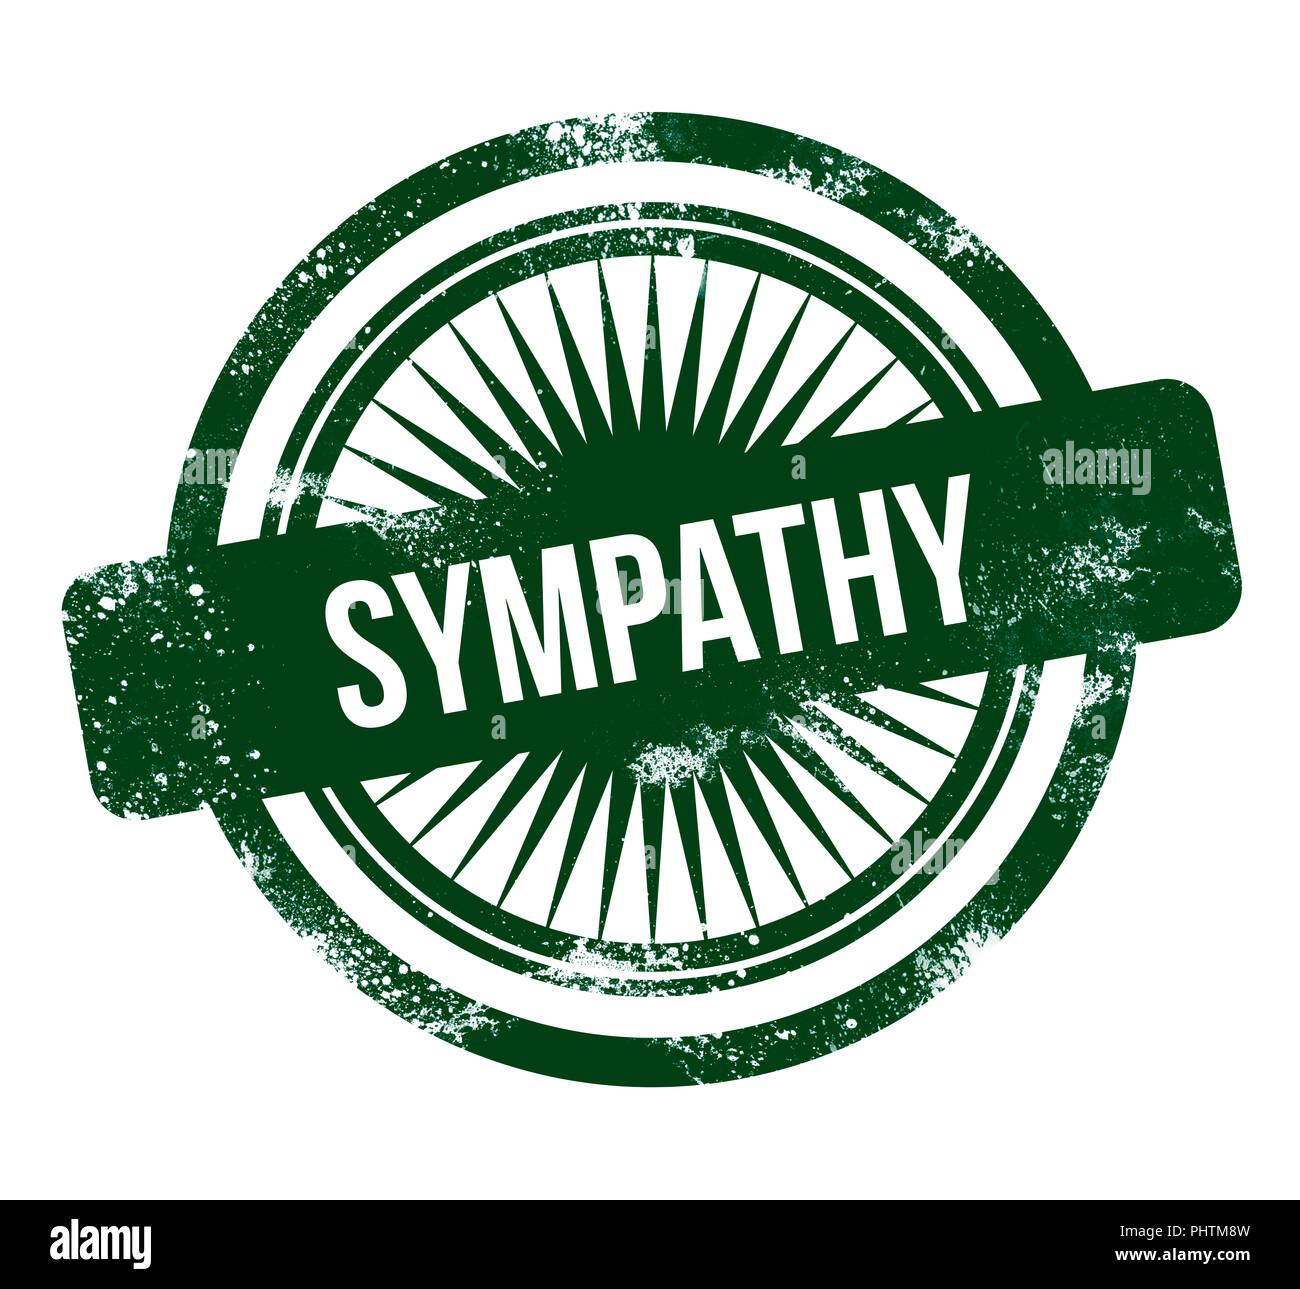 Simpatía - grunge sello verde Imagen De Stock